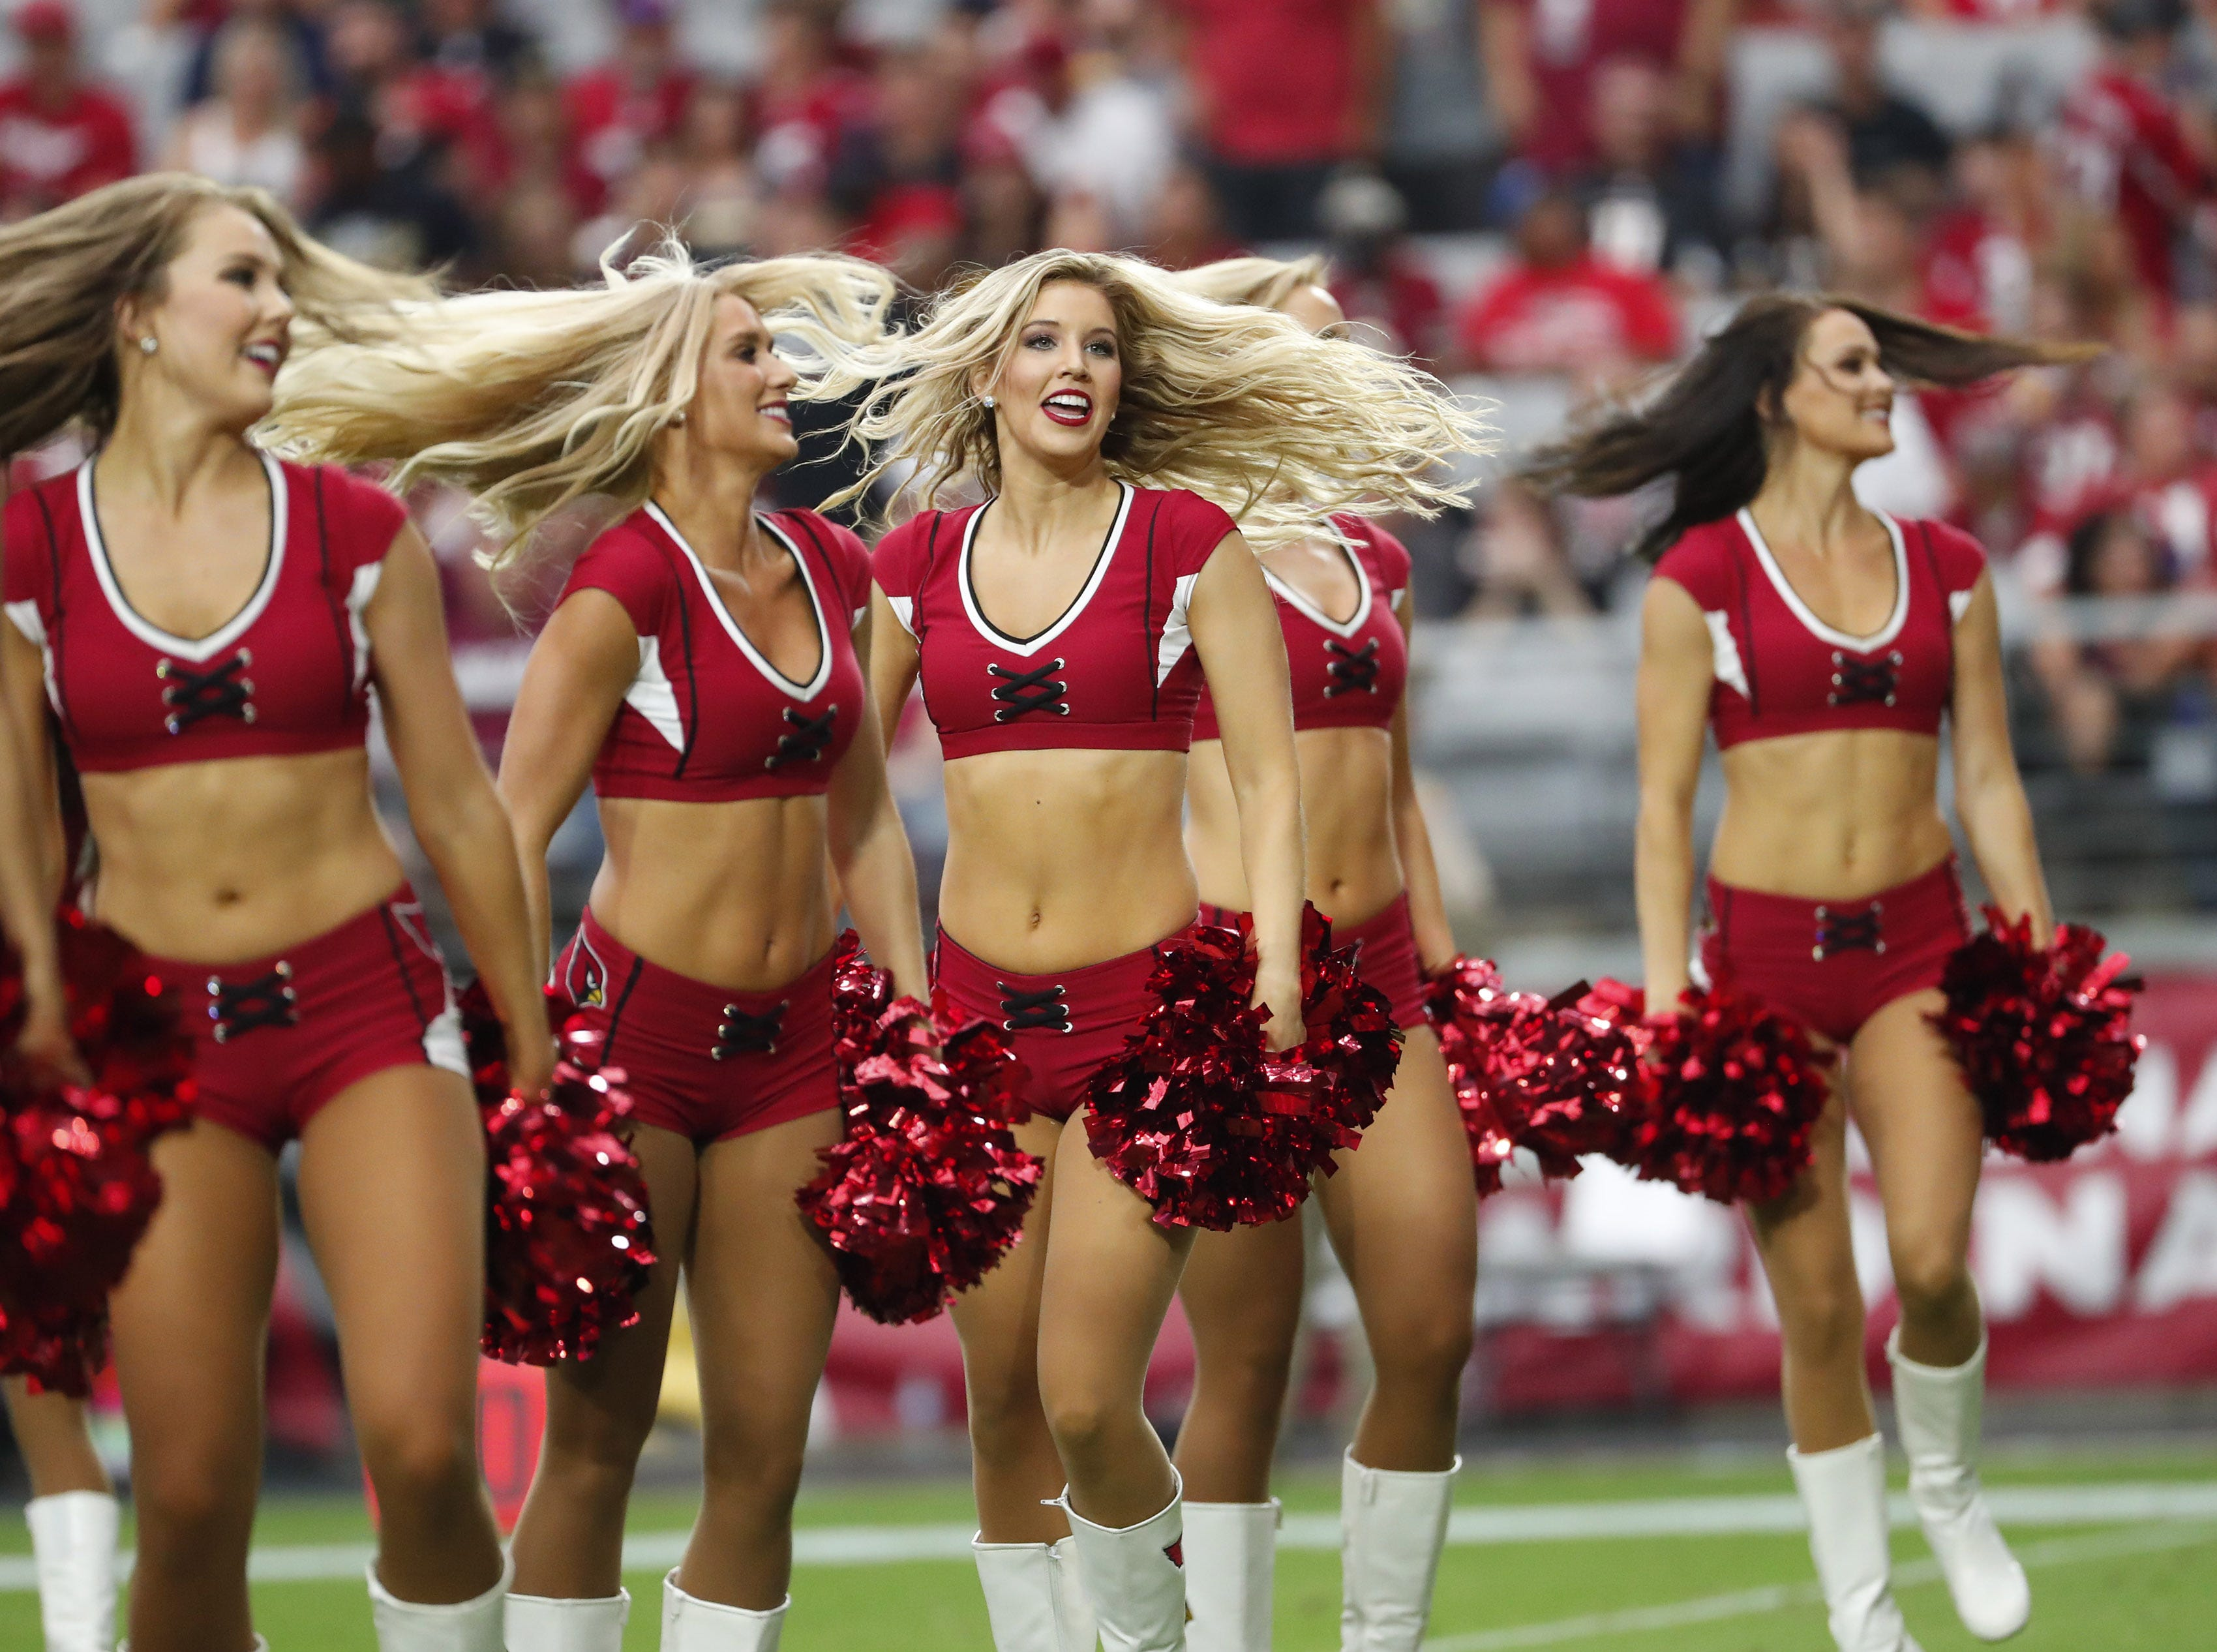 Arizona Cardinals cheerleaders perform during a break against the Washington Redskins at State Farm Stadium in Glendale, Ariz., on Sept. 9, 2018.